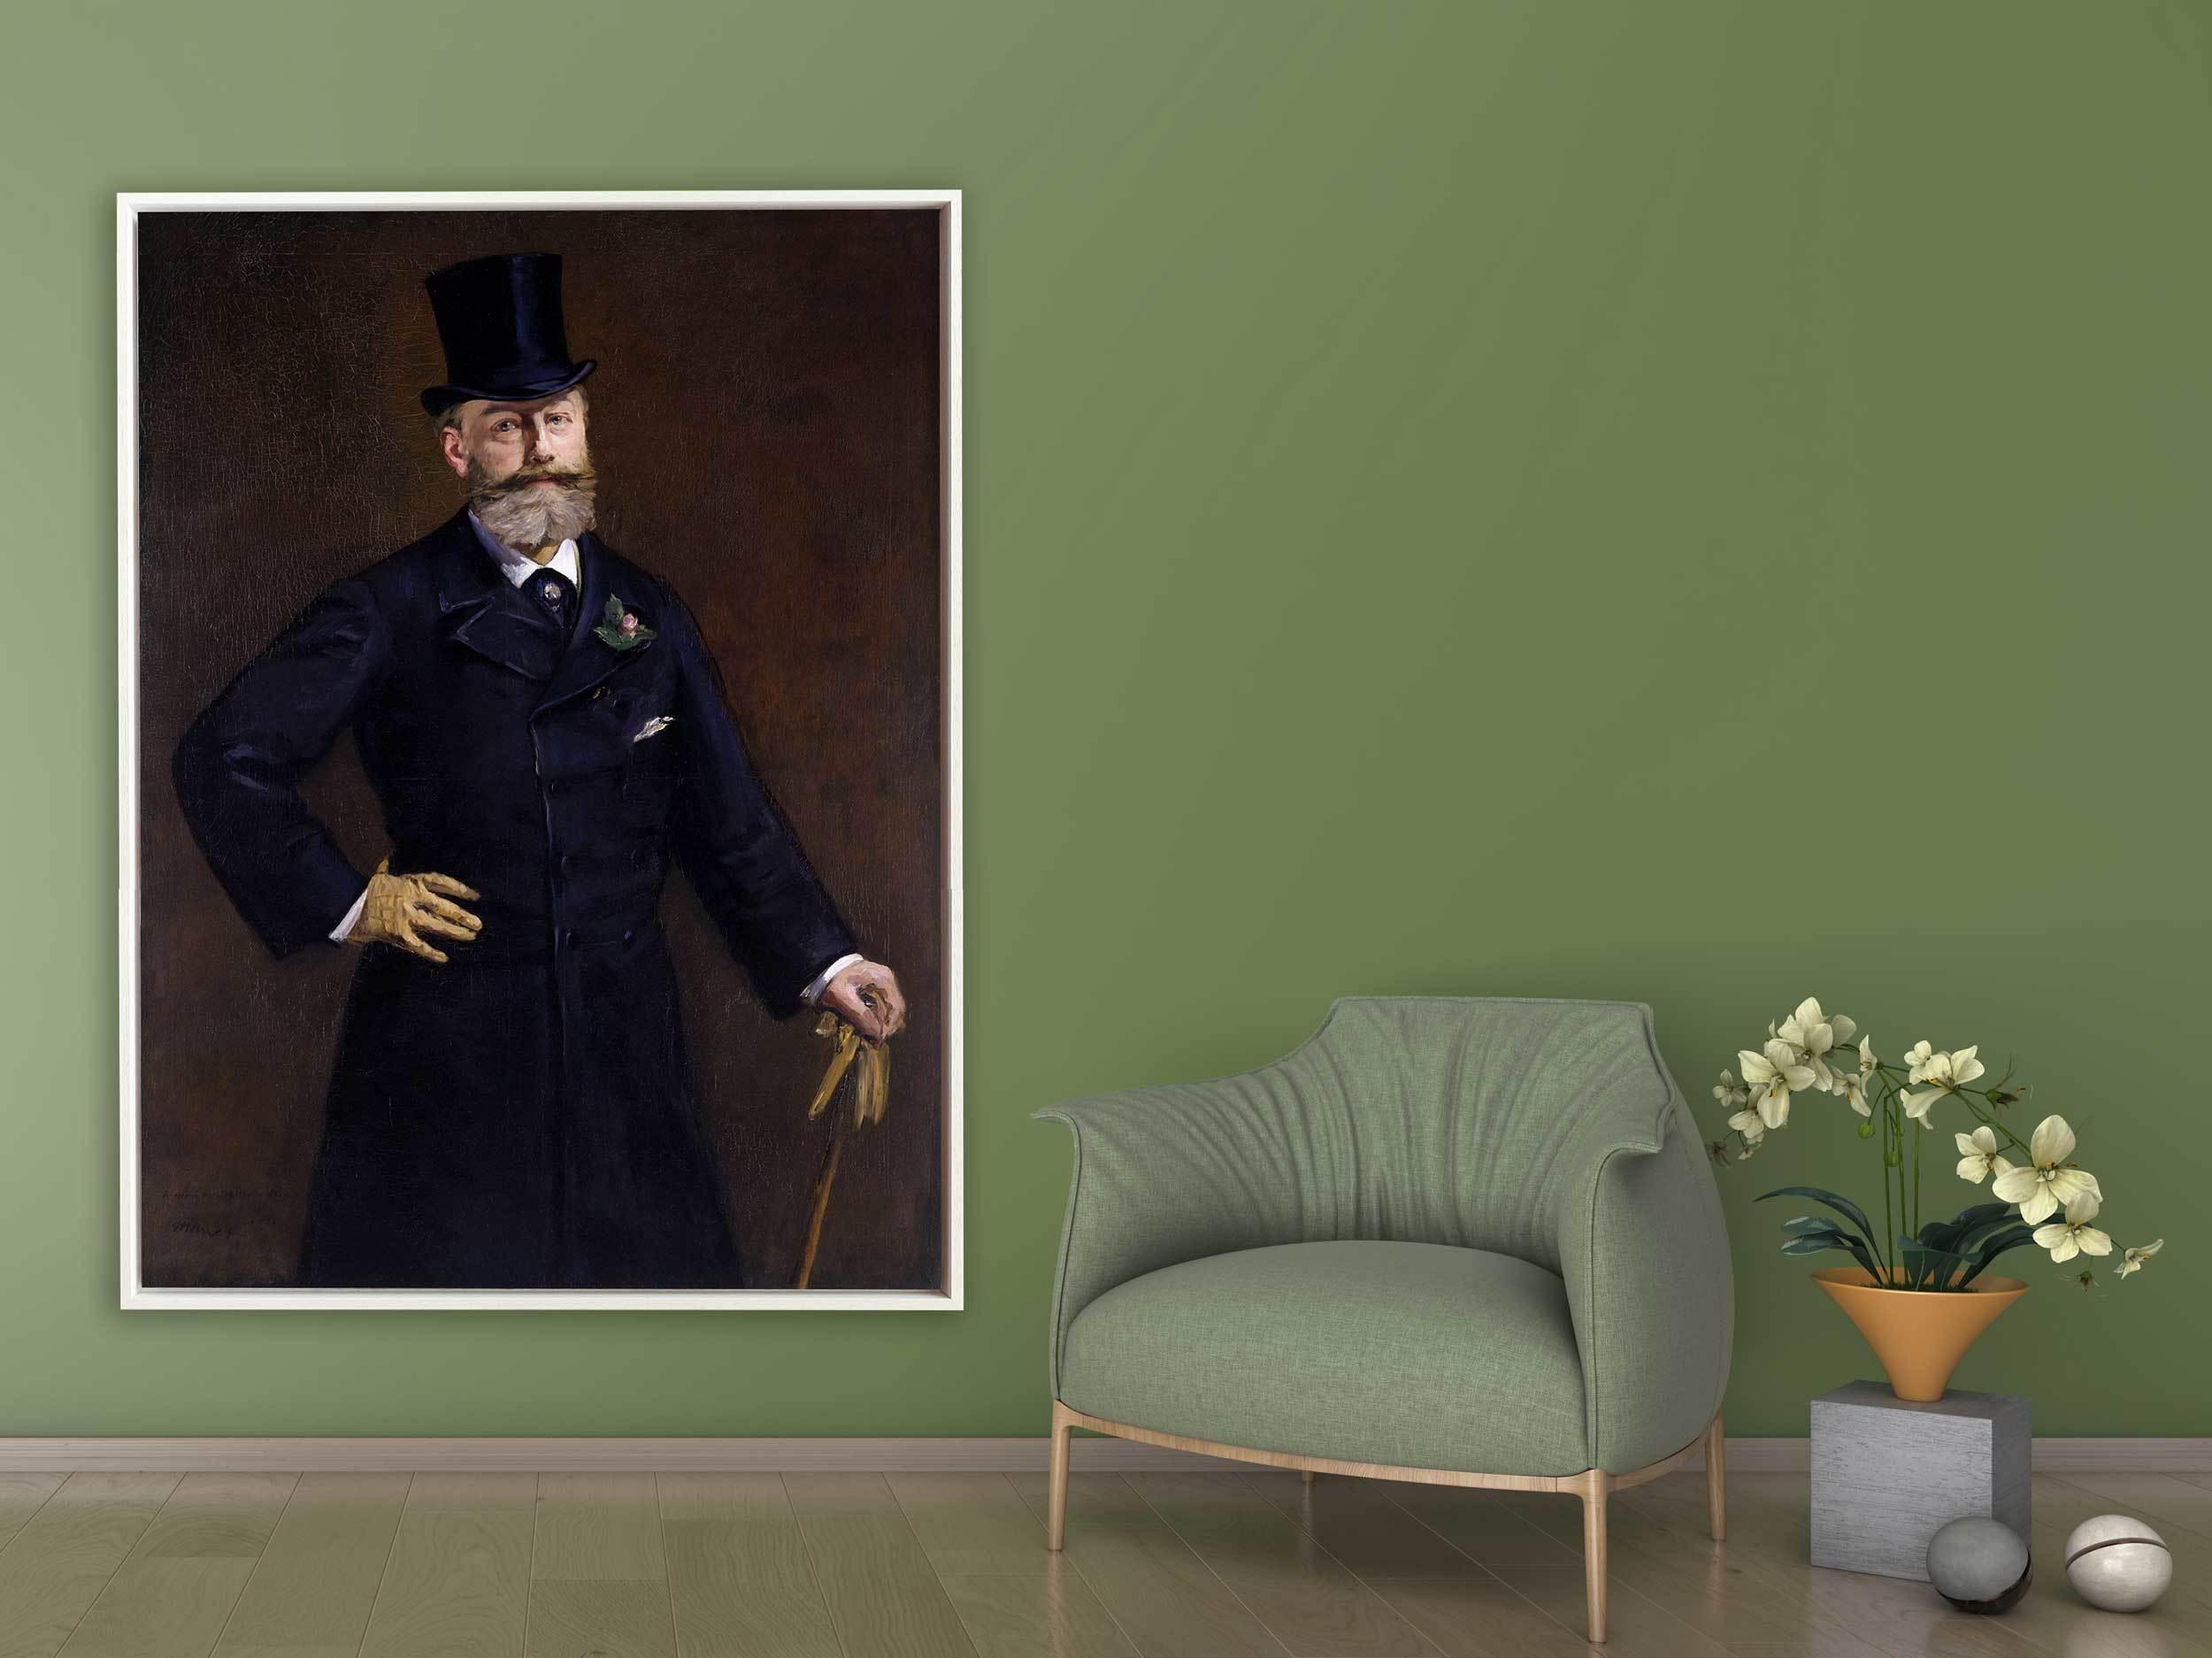 Edouard Manet - Antonin Proust, 1880, Schattenfugenrahmen weiß